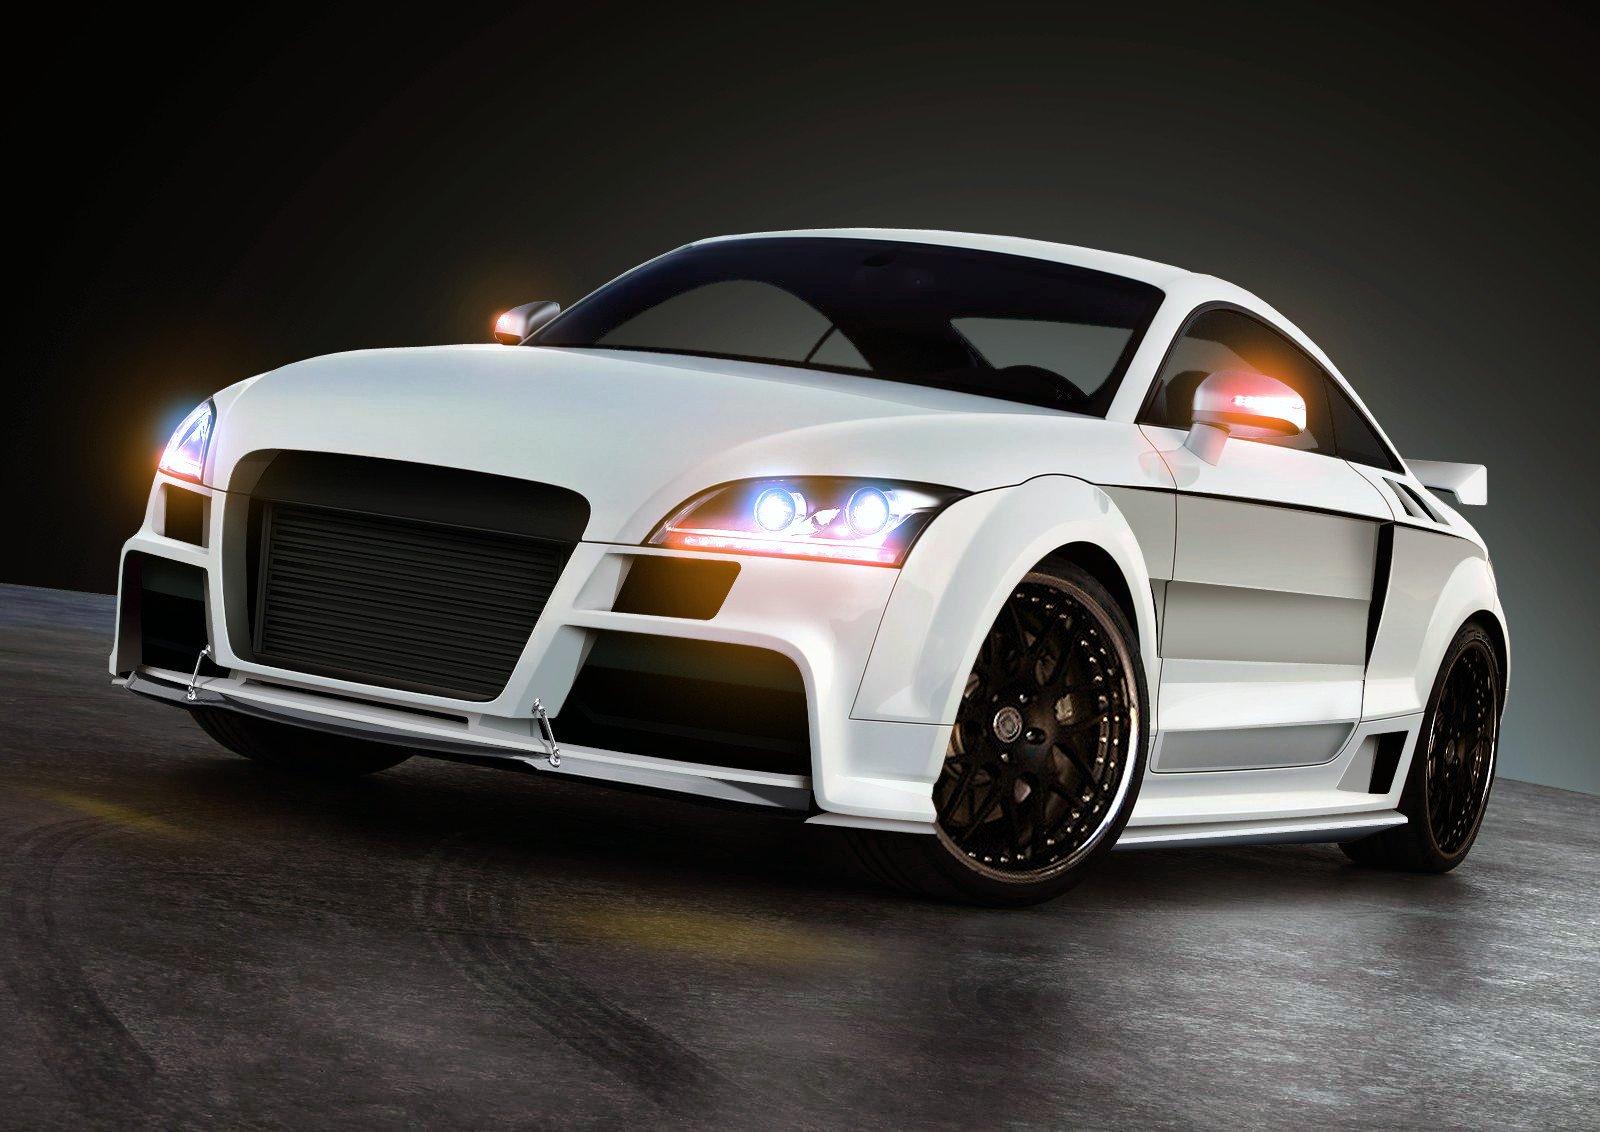 Audi TT RS Wallpapers HD Download 1600x1132